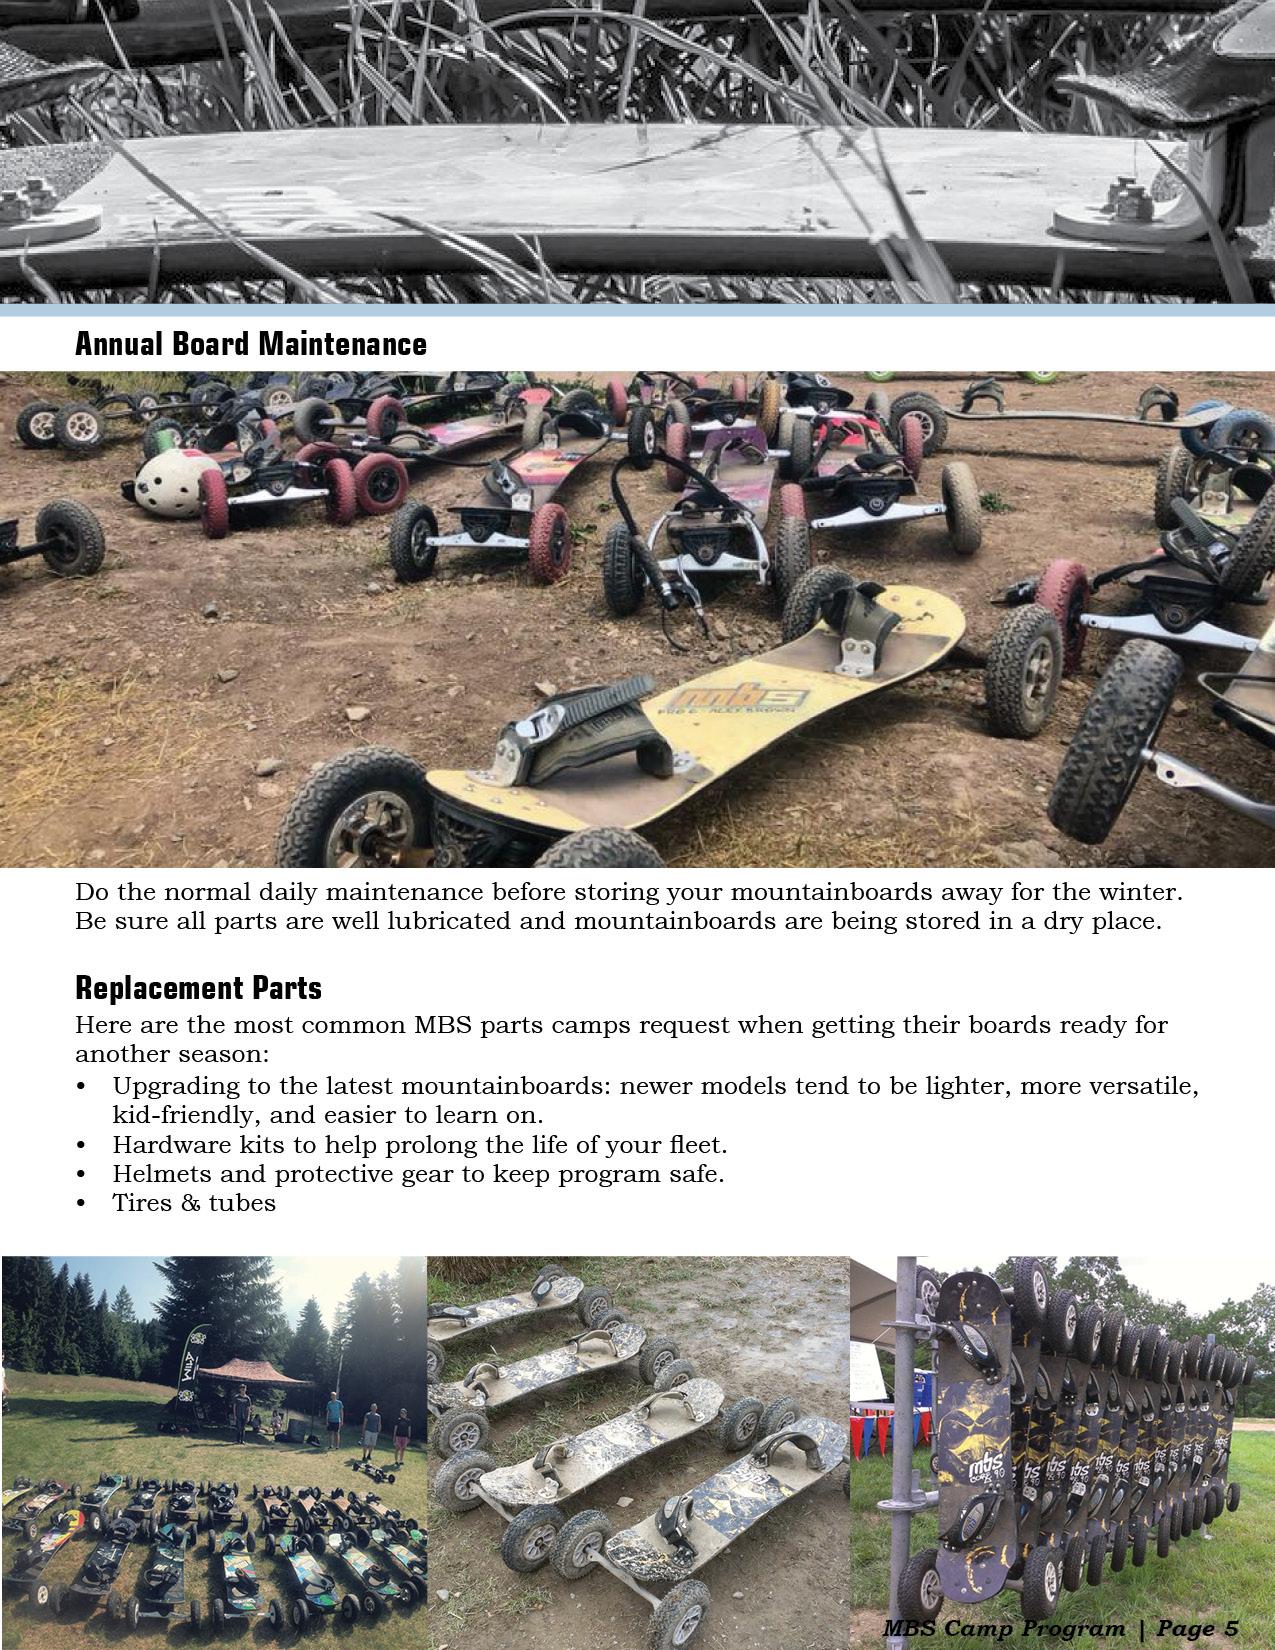 MBS Camp Program - Manual - Final Draft5.jpg